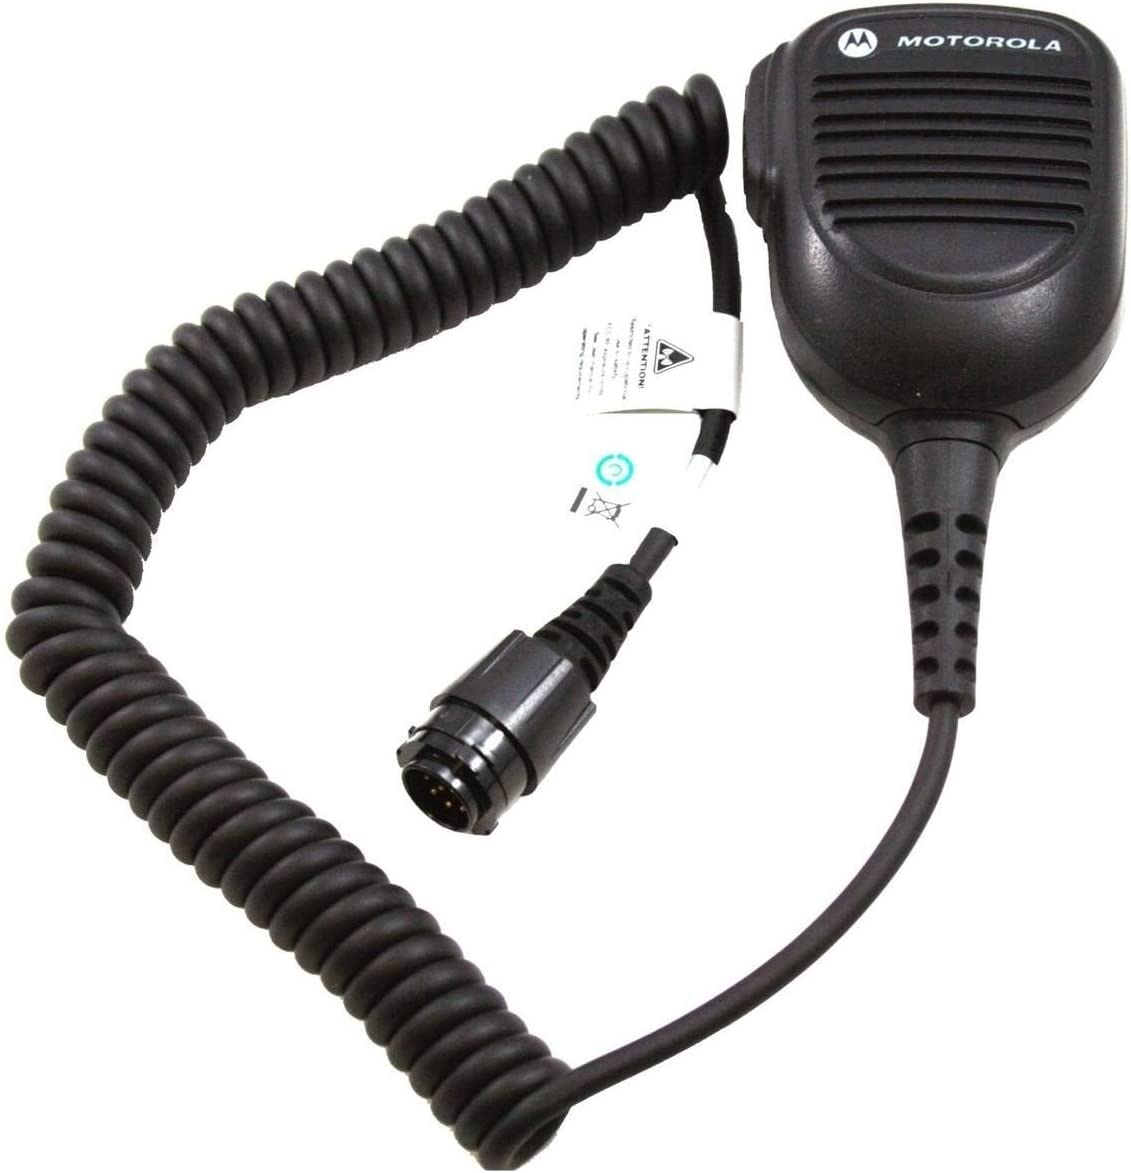 RMN5052 Compact Palm  Mobile Mic For Motorola XPR4380 XPR4500 XPR4550 XPR4580